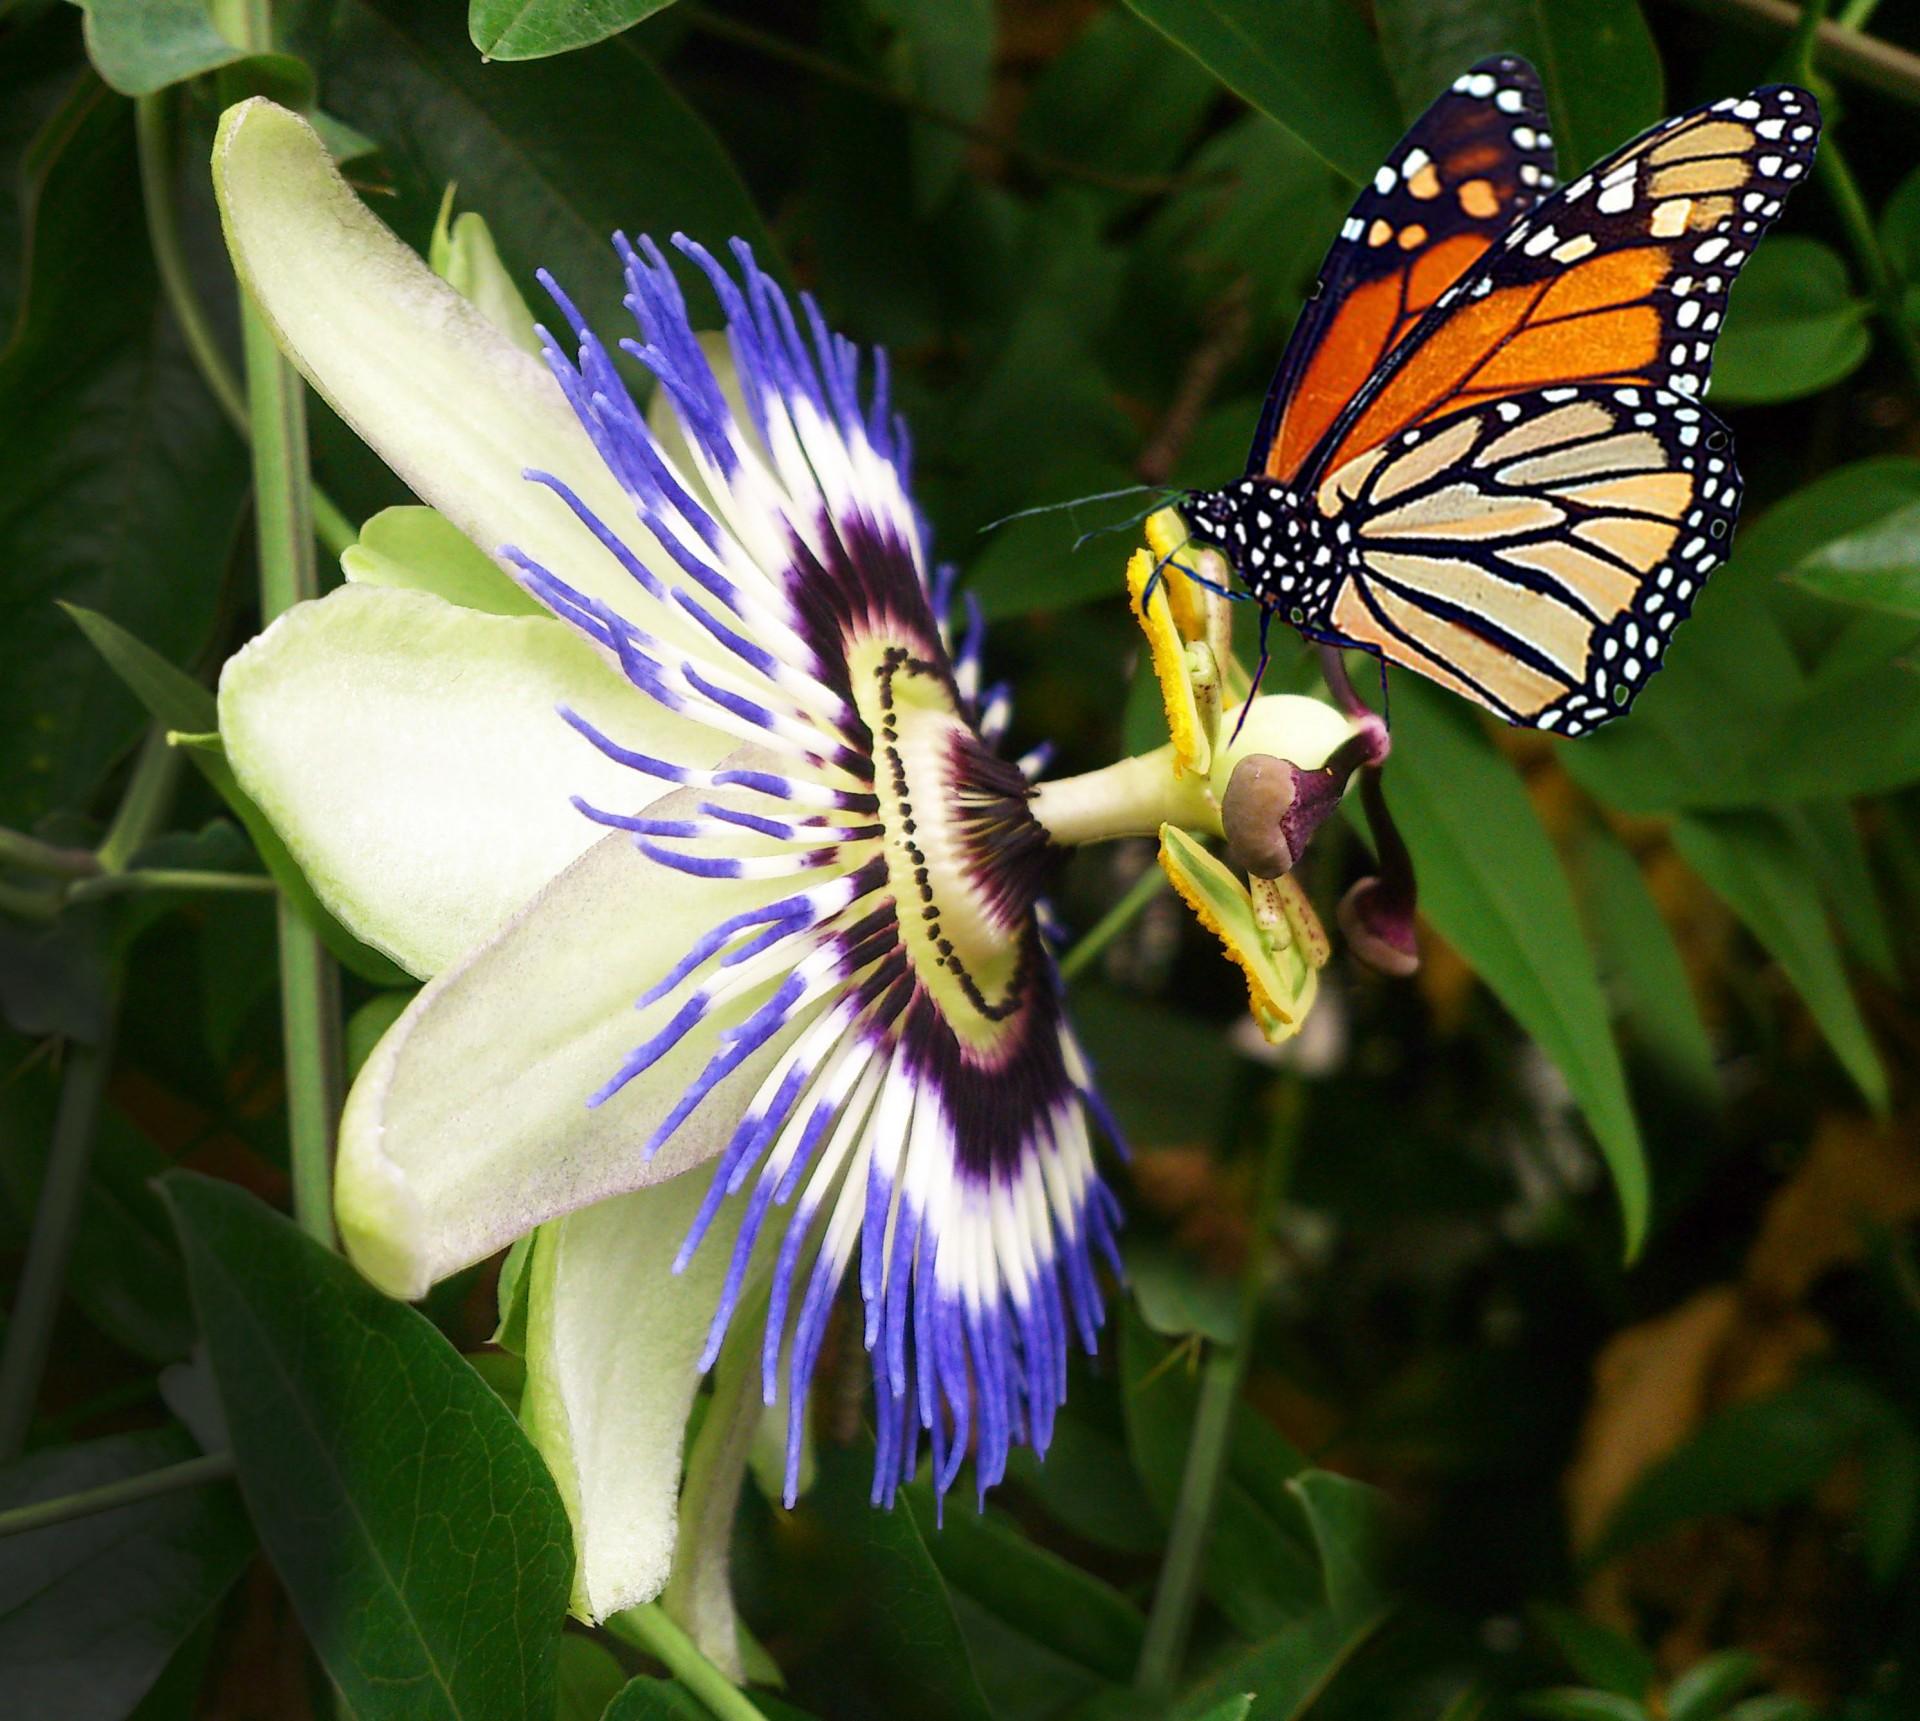 https://i0.wp.com/www.publicdomainpictures.net/pictures/60000/velka/passion-flower.jpg